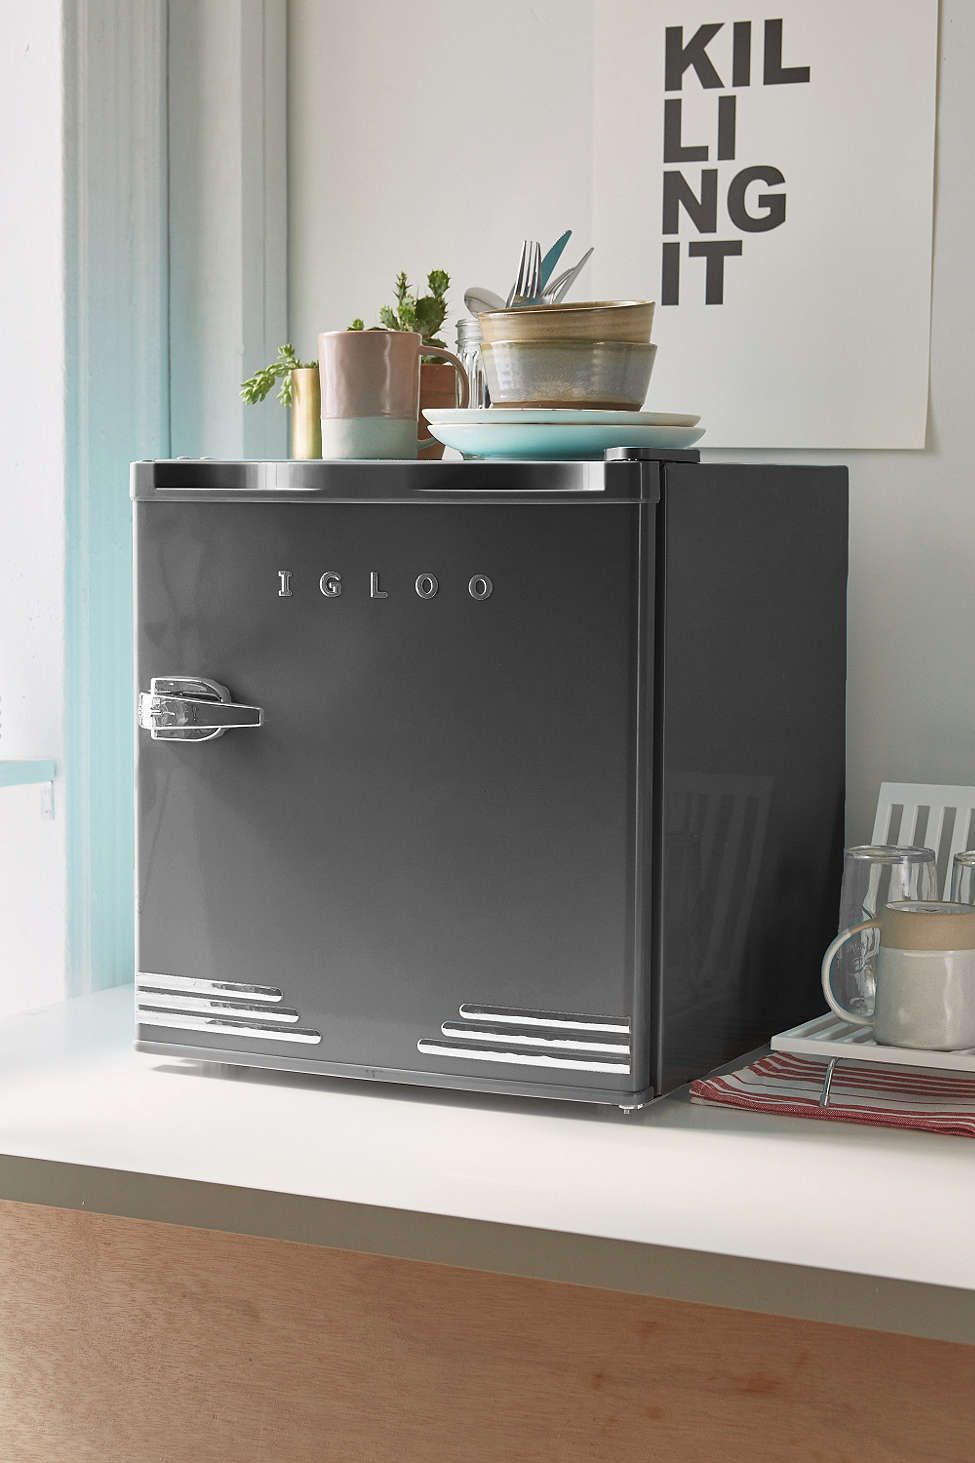 office mini refrigerator. Igloo Mini Refrigerator Office Z